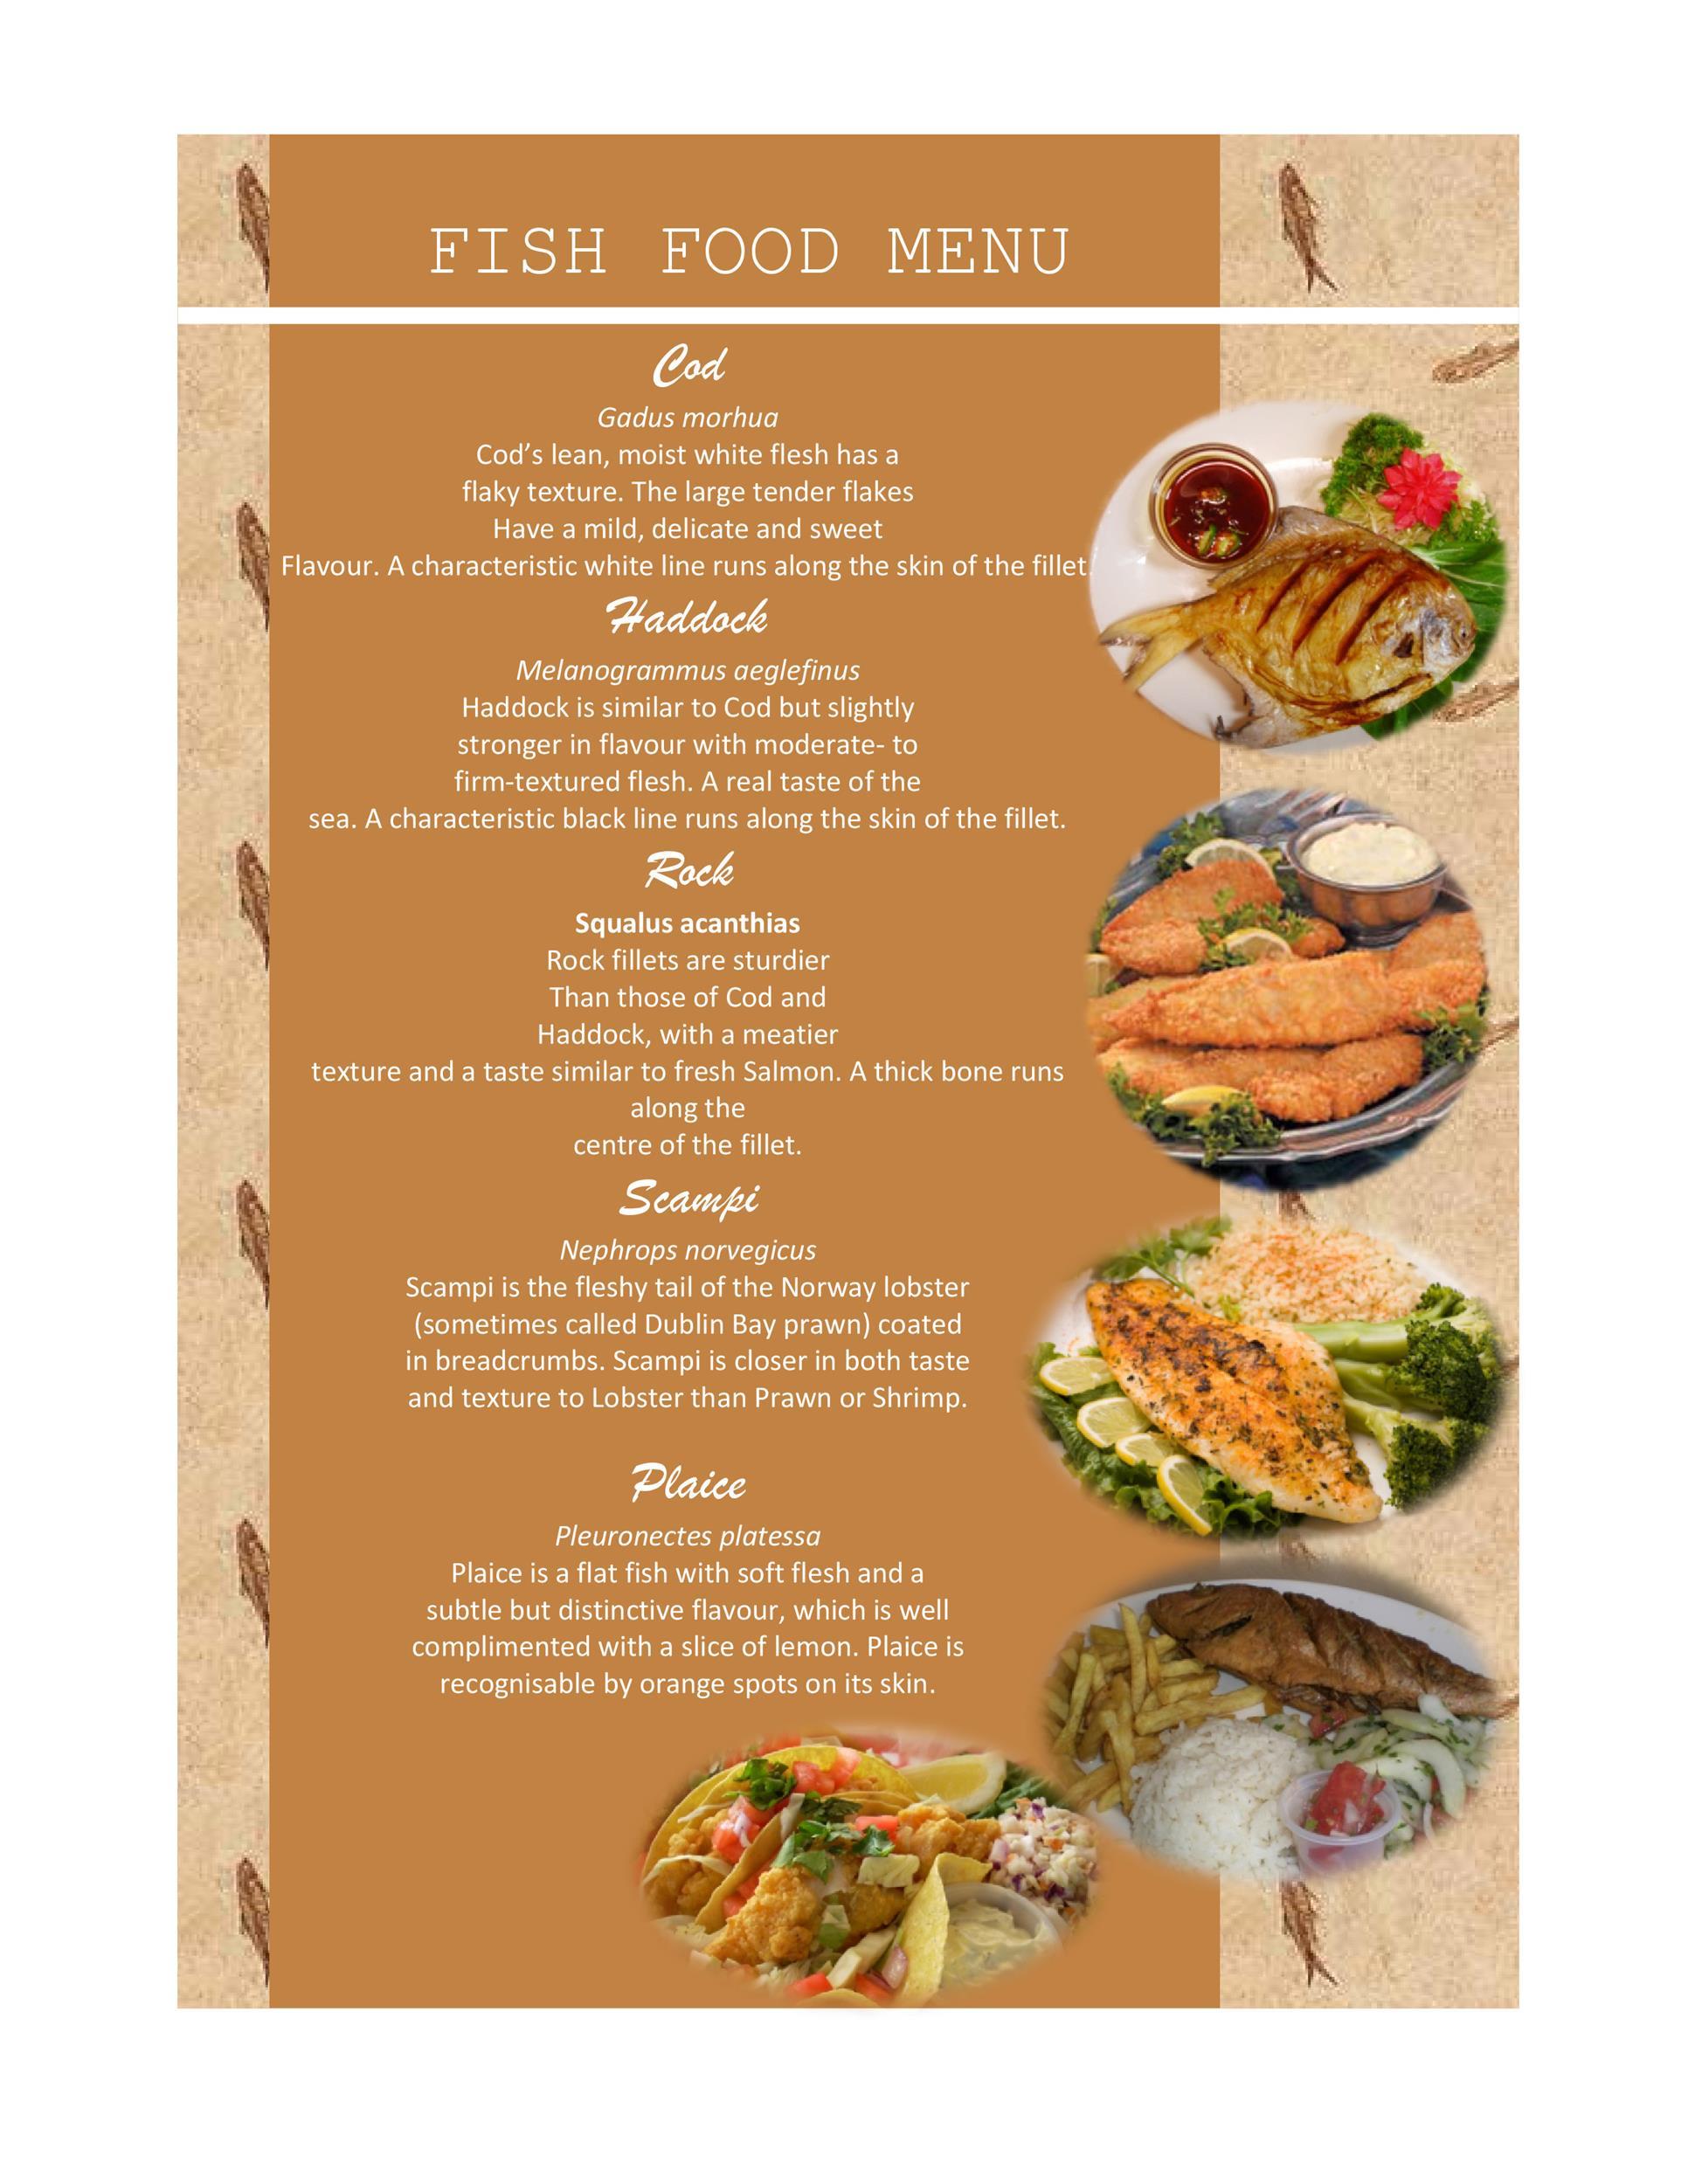 30 Restaurant Menu Templates  Designs - Template Lab - a la carte menu template